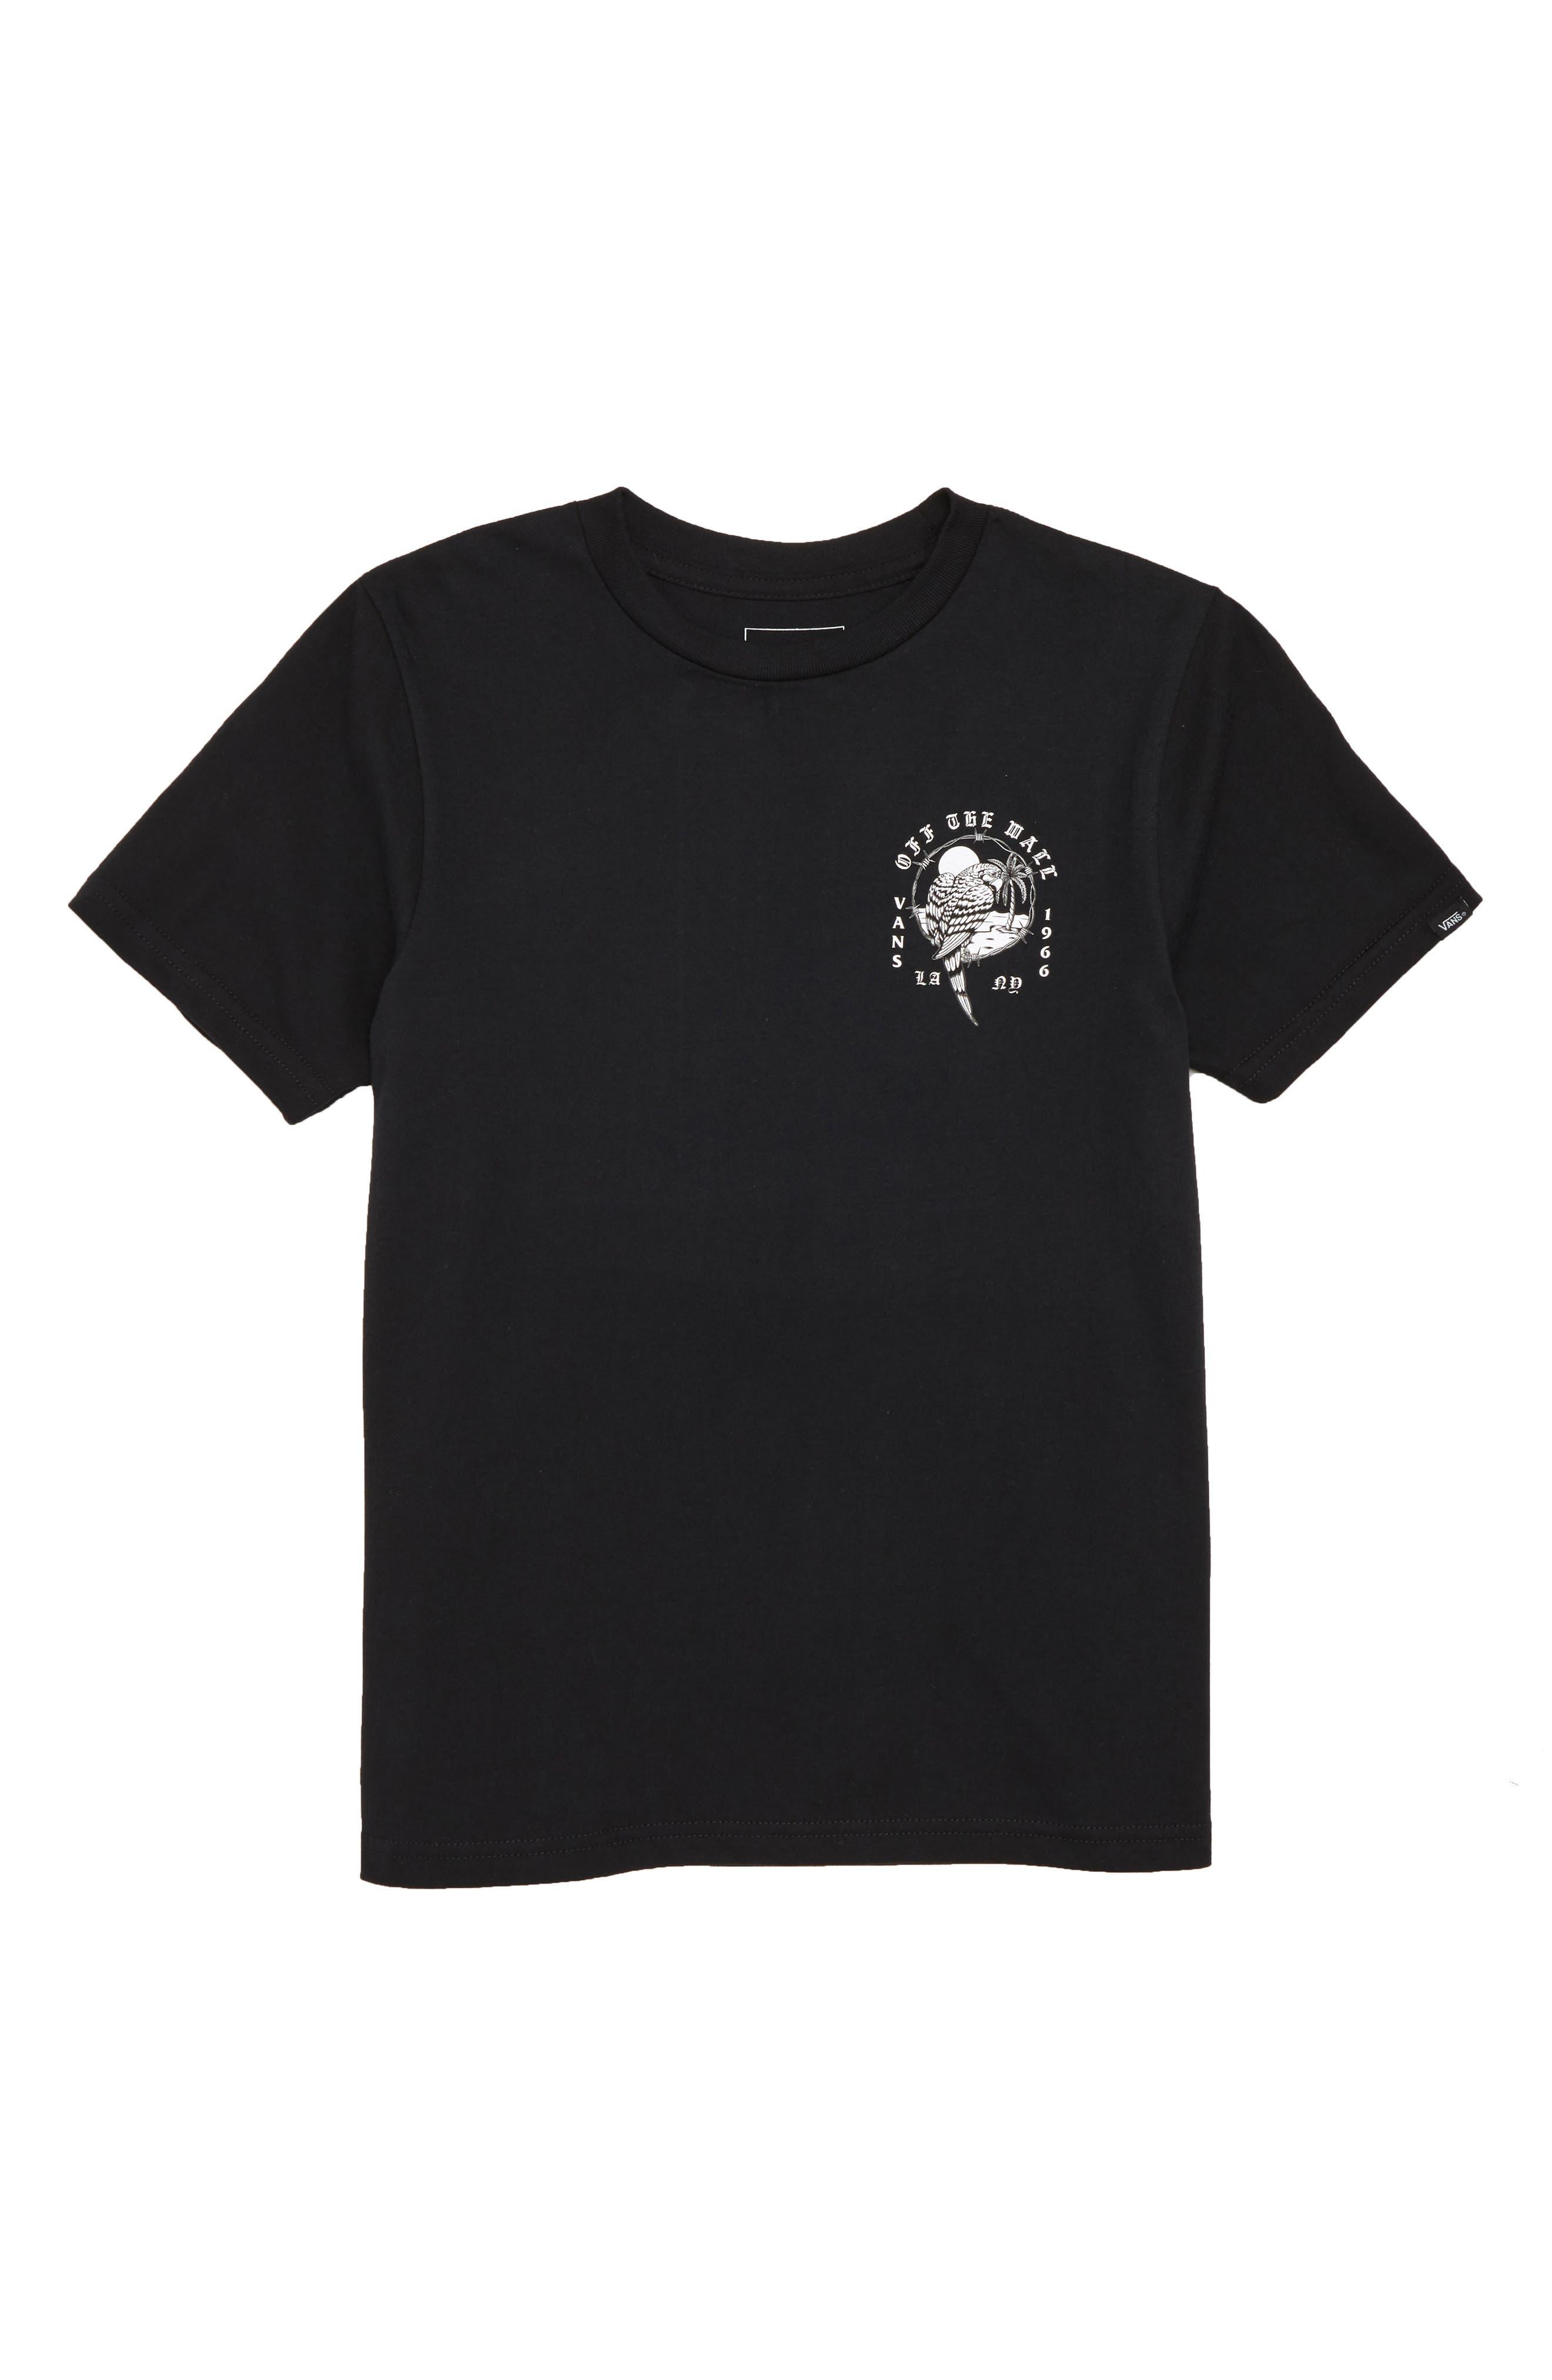 Parrot Beach Graphic T-Shirt,                             Main thumbnail 1, color,                             001